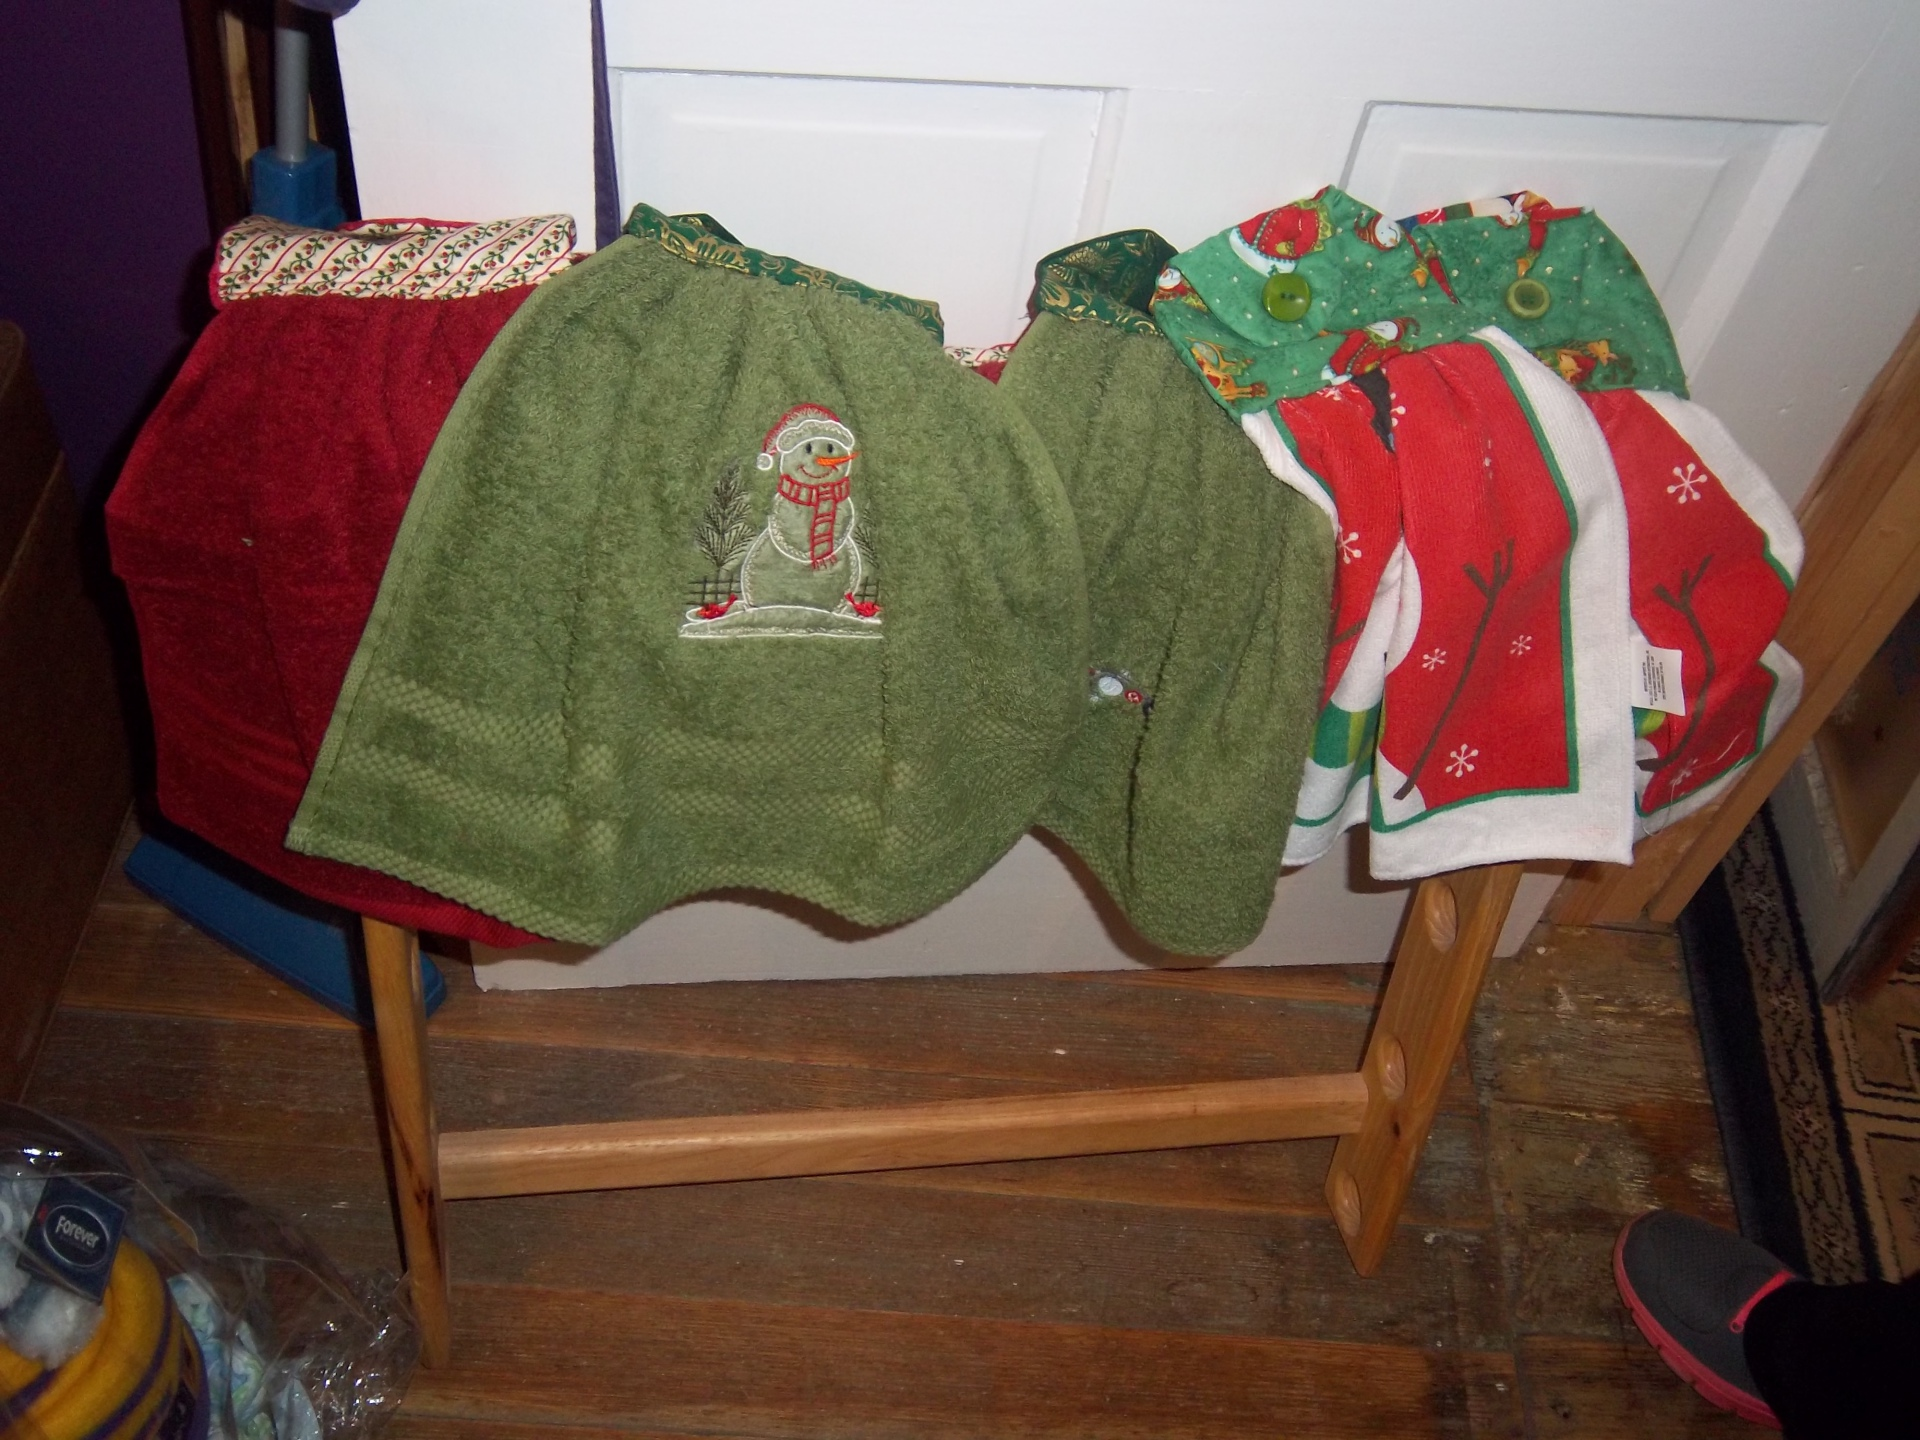 Kitchen Towels $6.50/Each